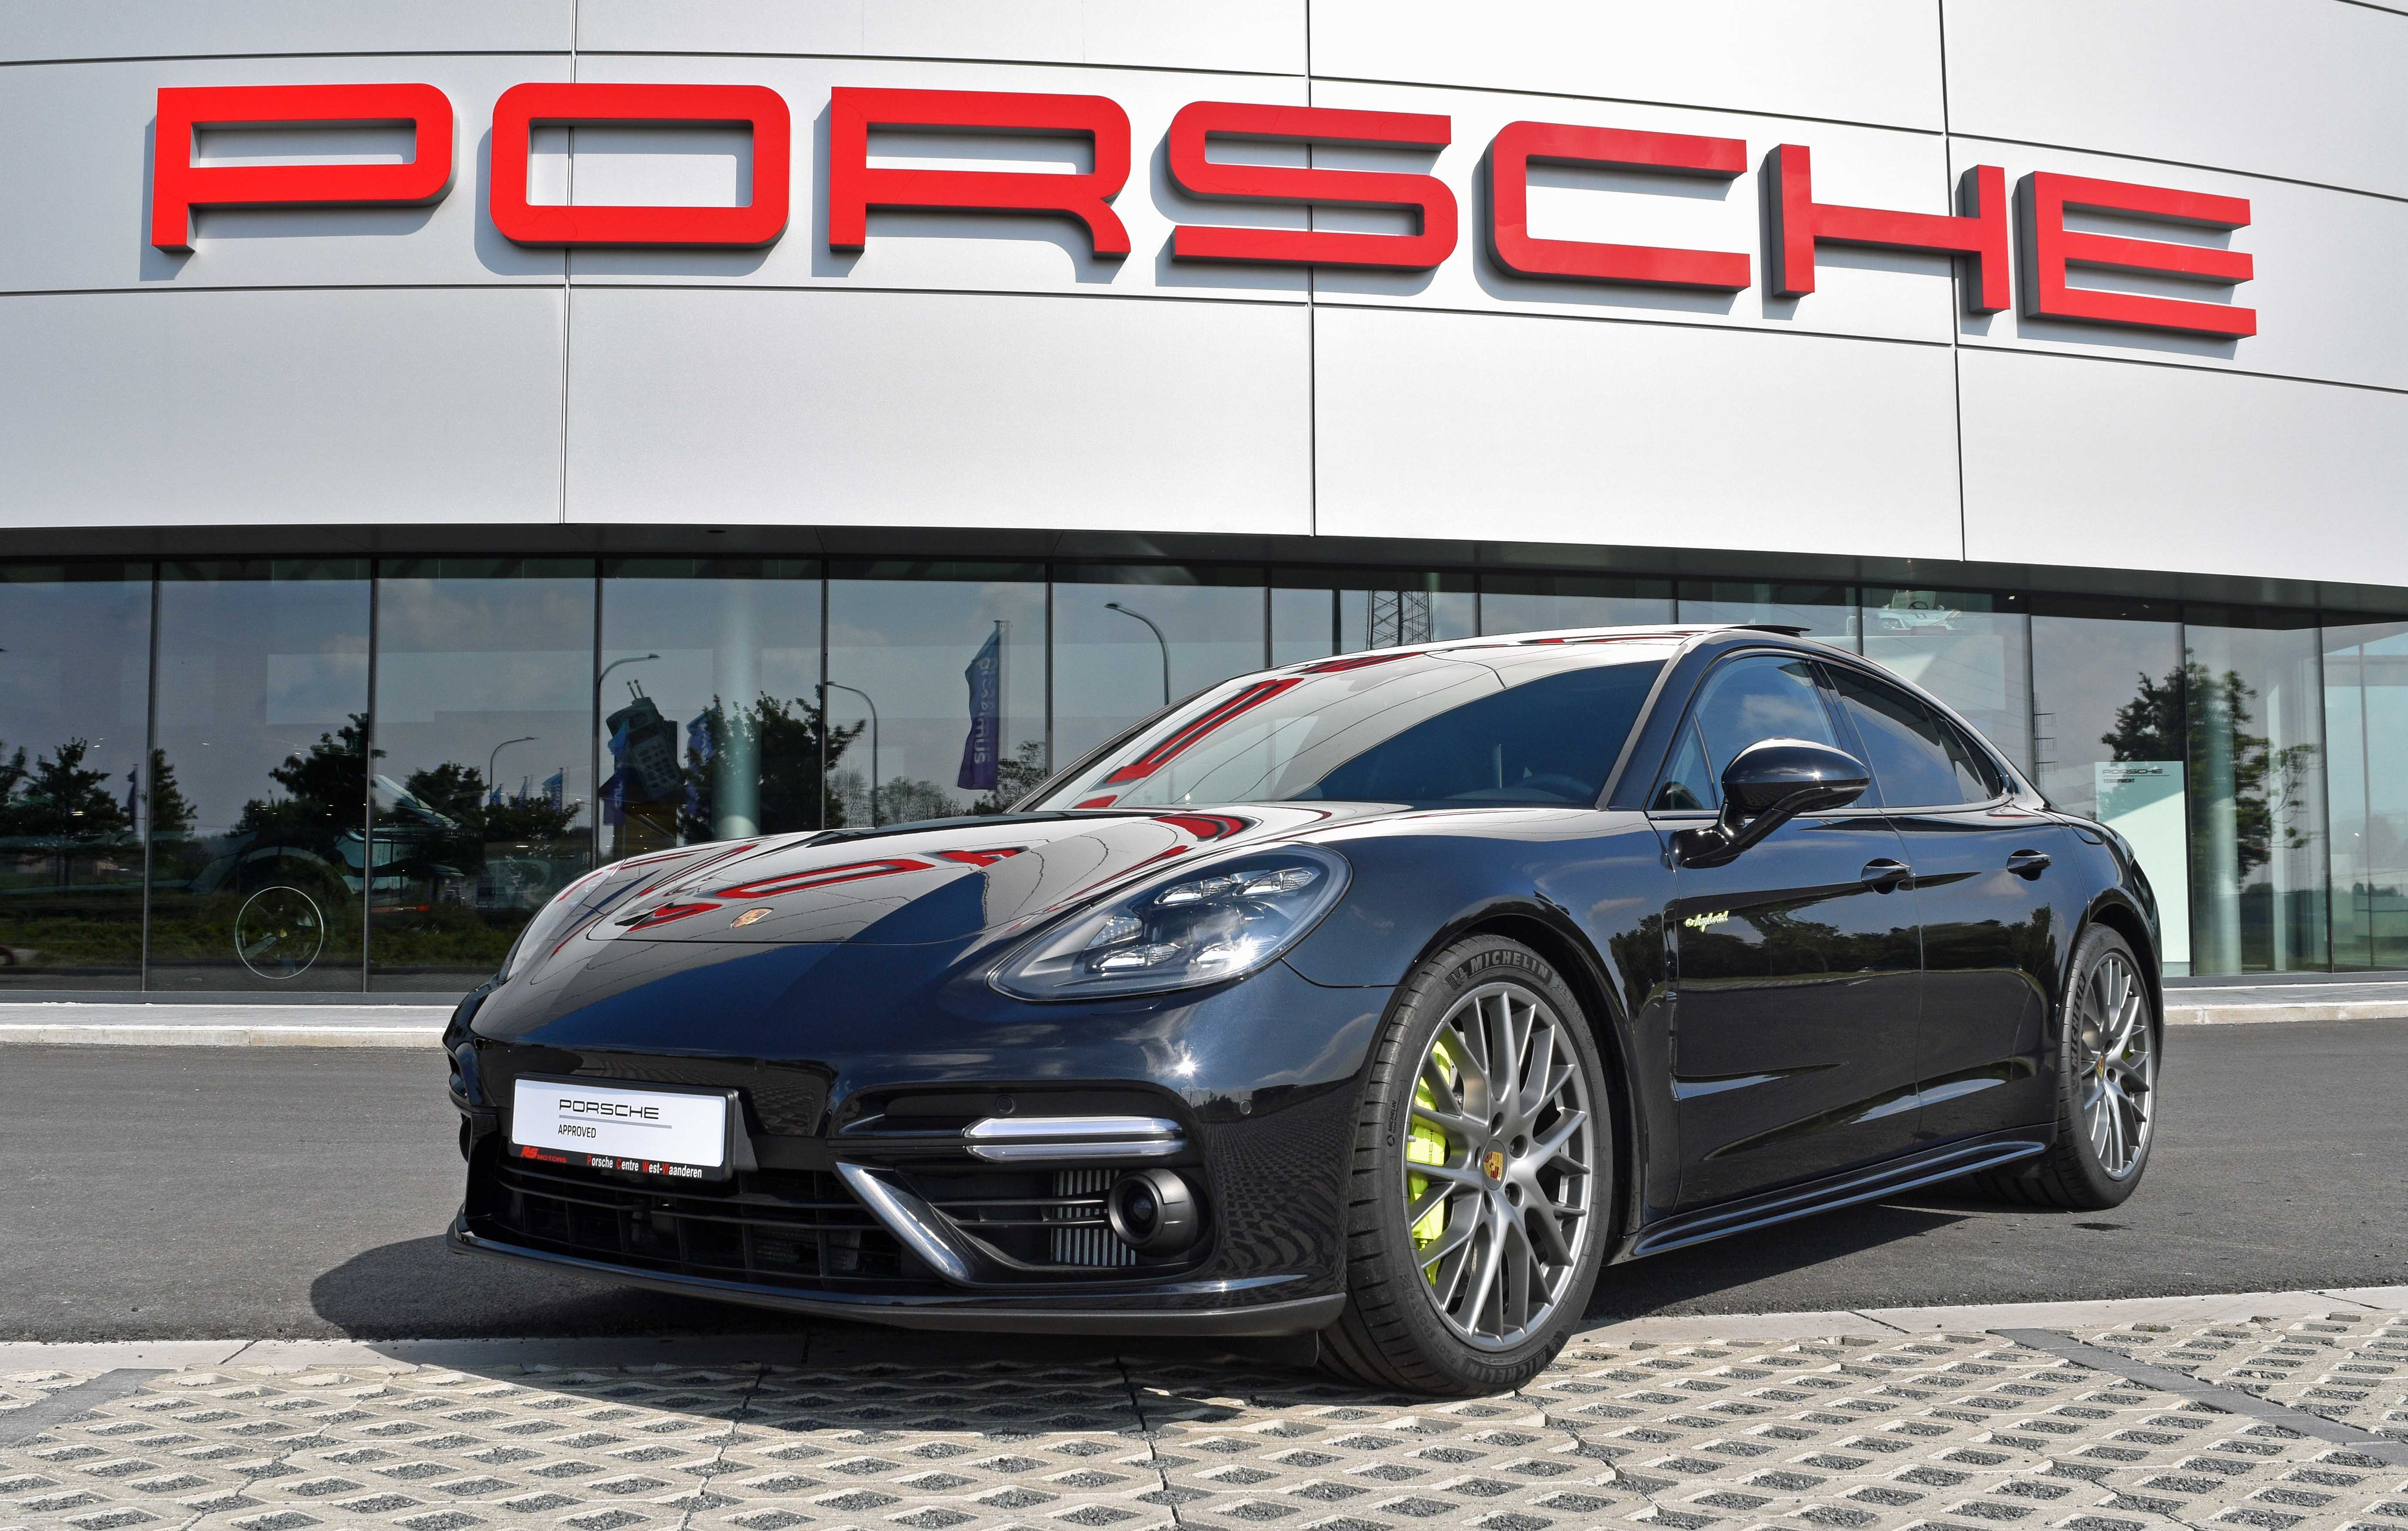 2017 Porsche Panamera Turbo S E Hybrid Porsche Approved Rs Motors Porsche Centre West Vlaanderen Belgium Classic Driver Market